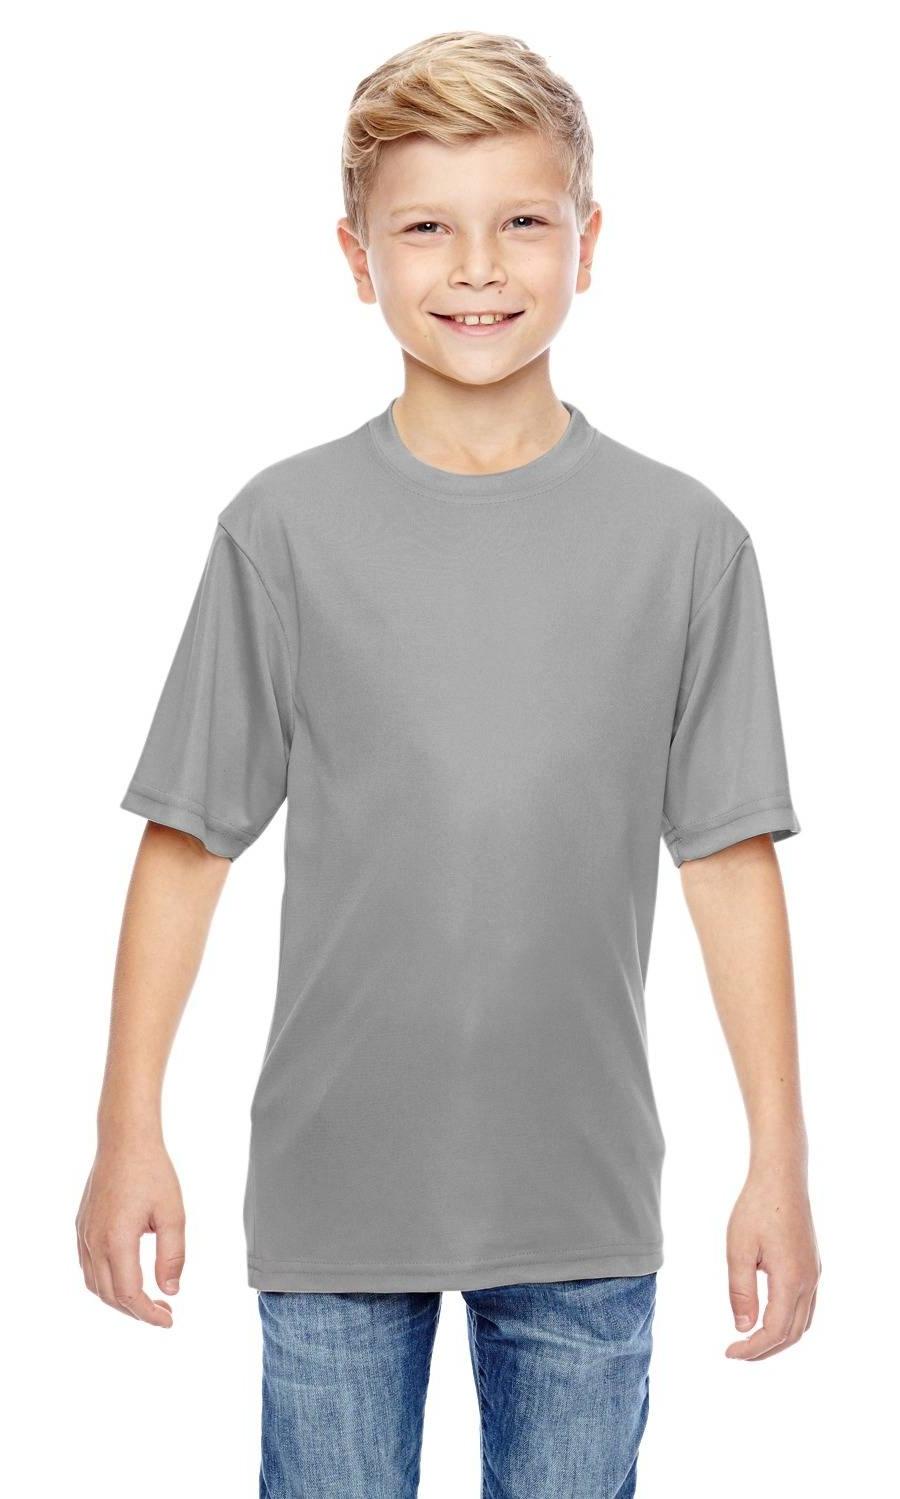 Augusta Sportswear Boys Performance T-Shirt